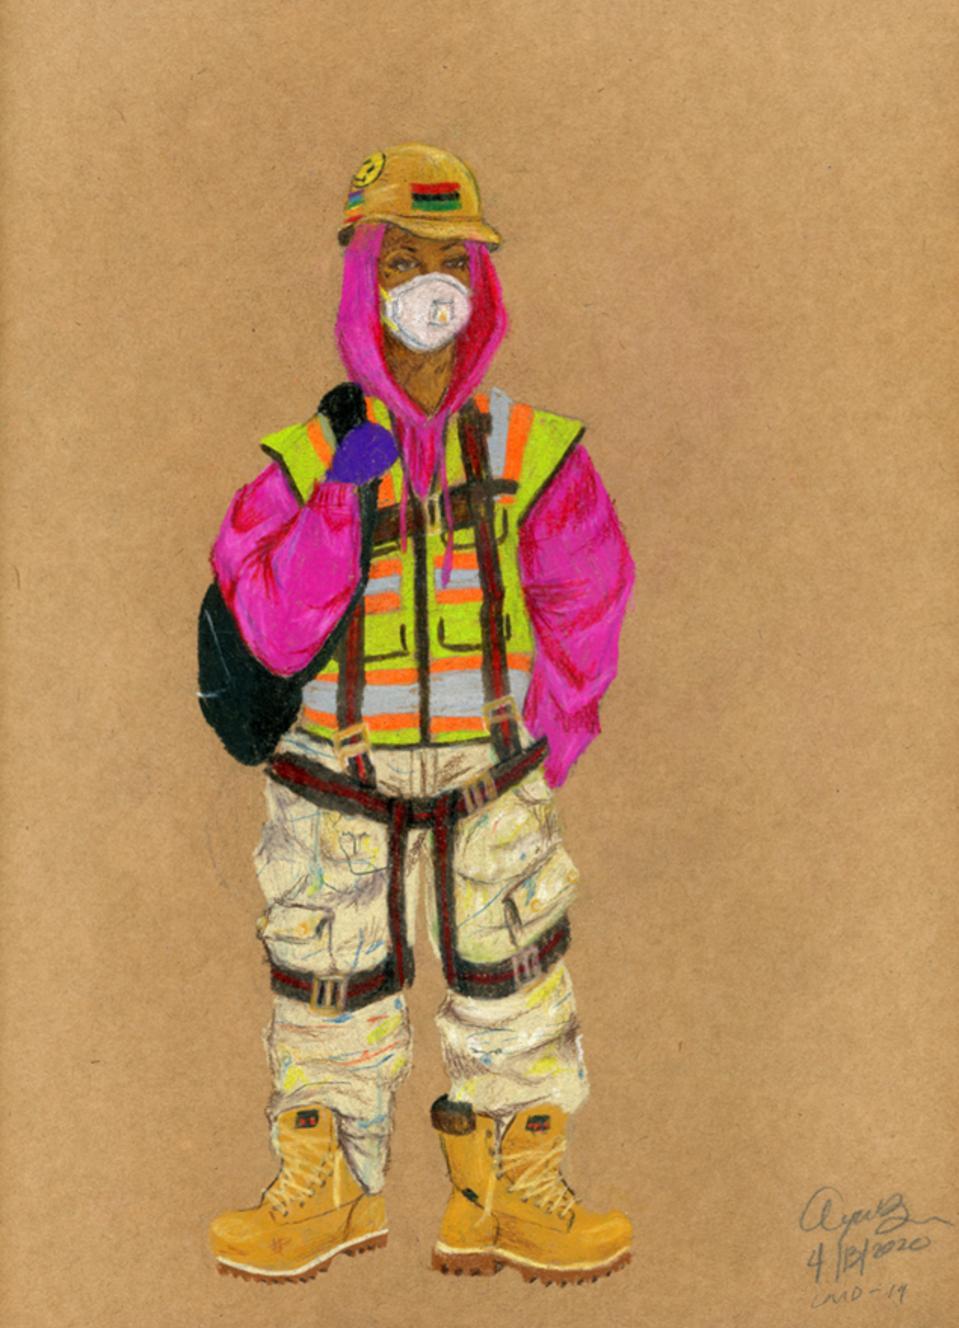 Brooklyn-based artist Aya Brown artwork of a first responder